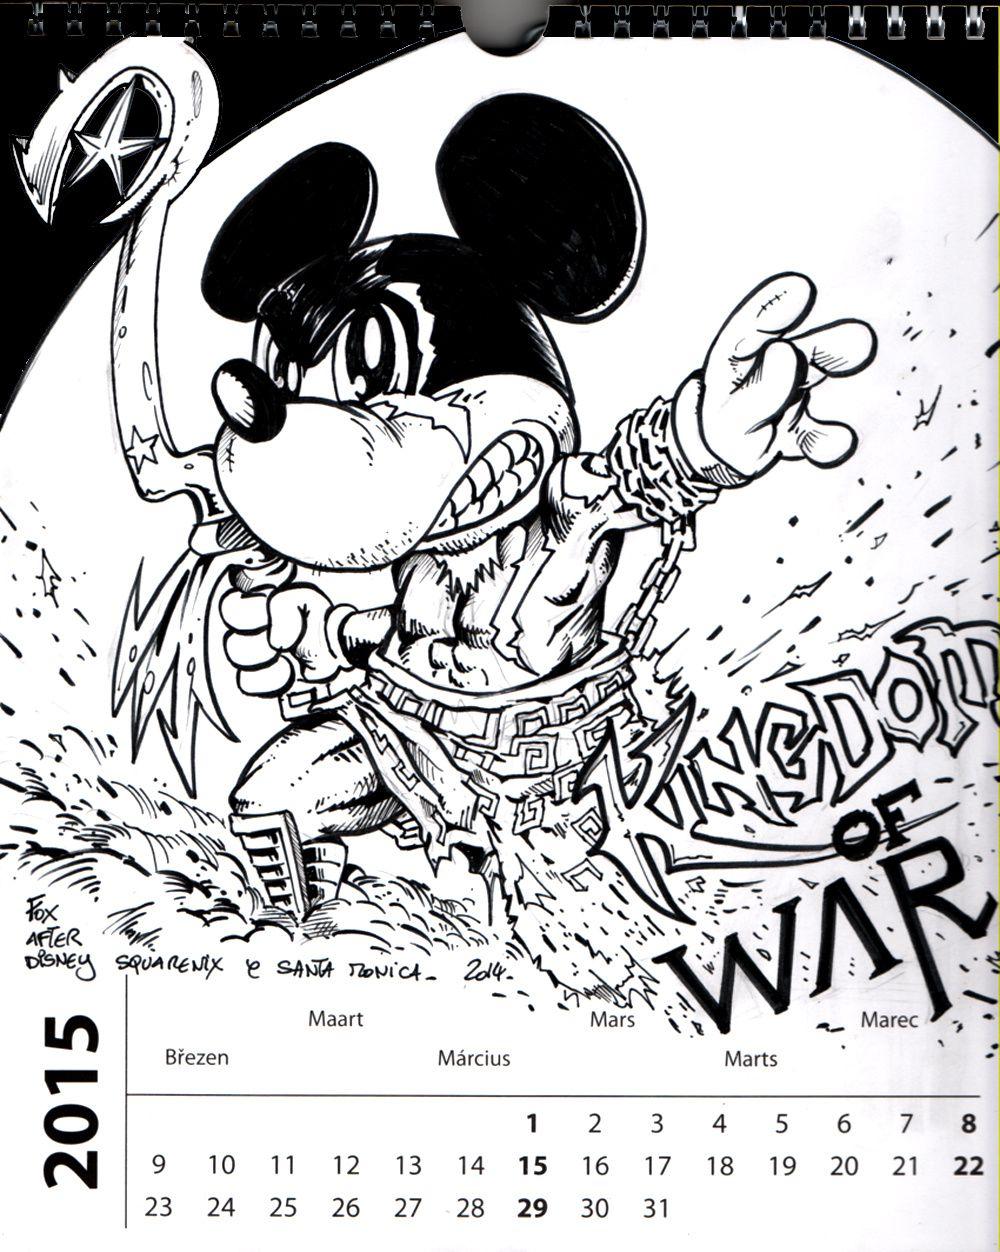 calendrier 2015 mars (kingdom of war) noir et blanc